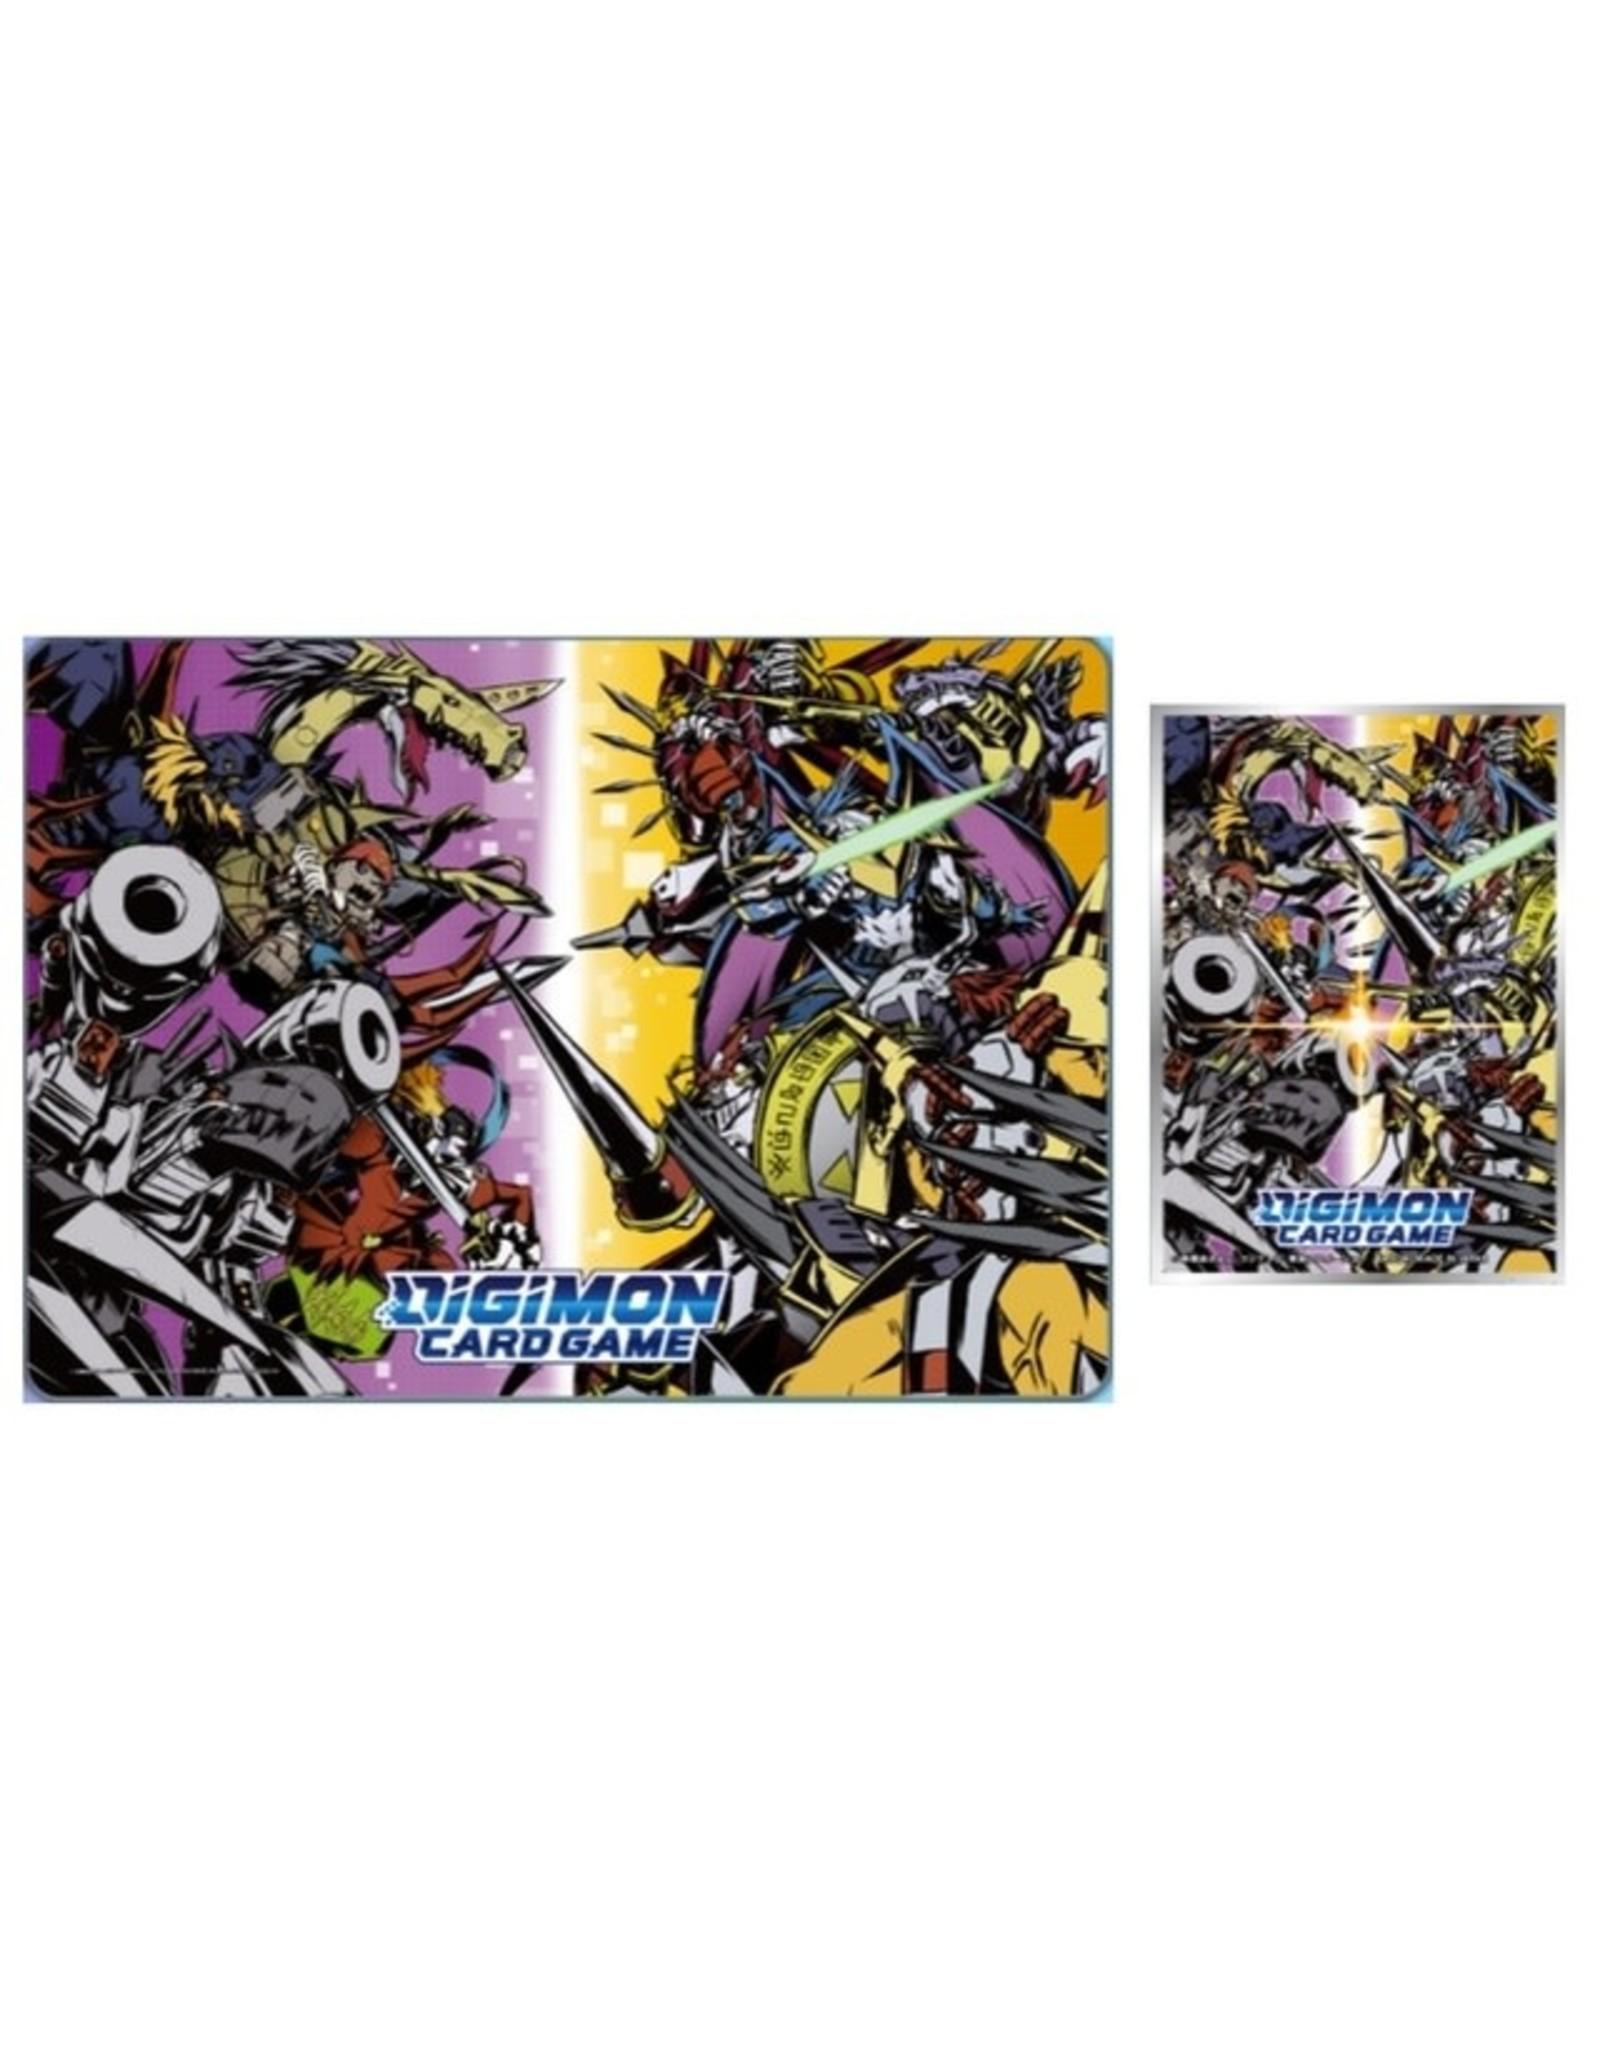 Bandai Digimon Tamer's Set - Exclusive Playmat and Sleeves